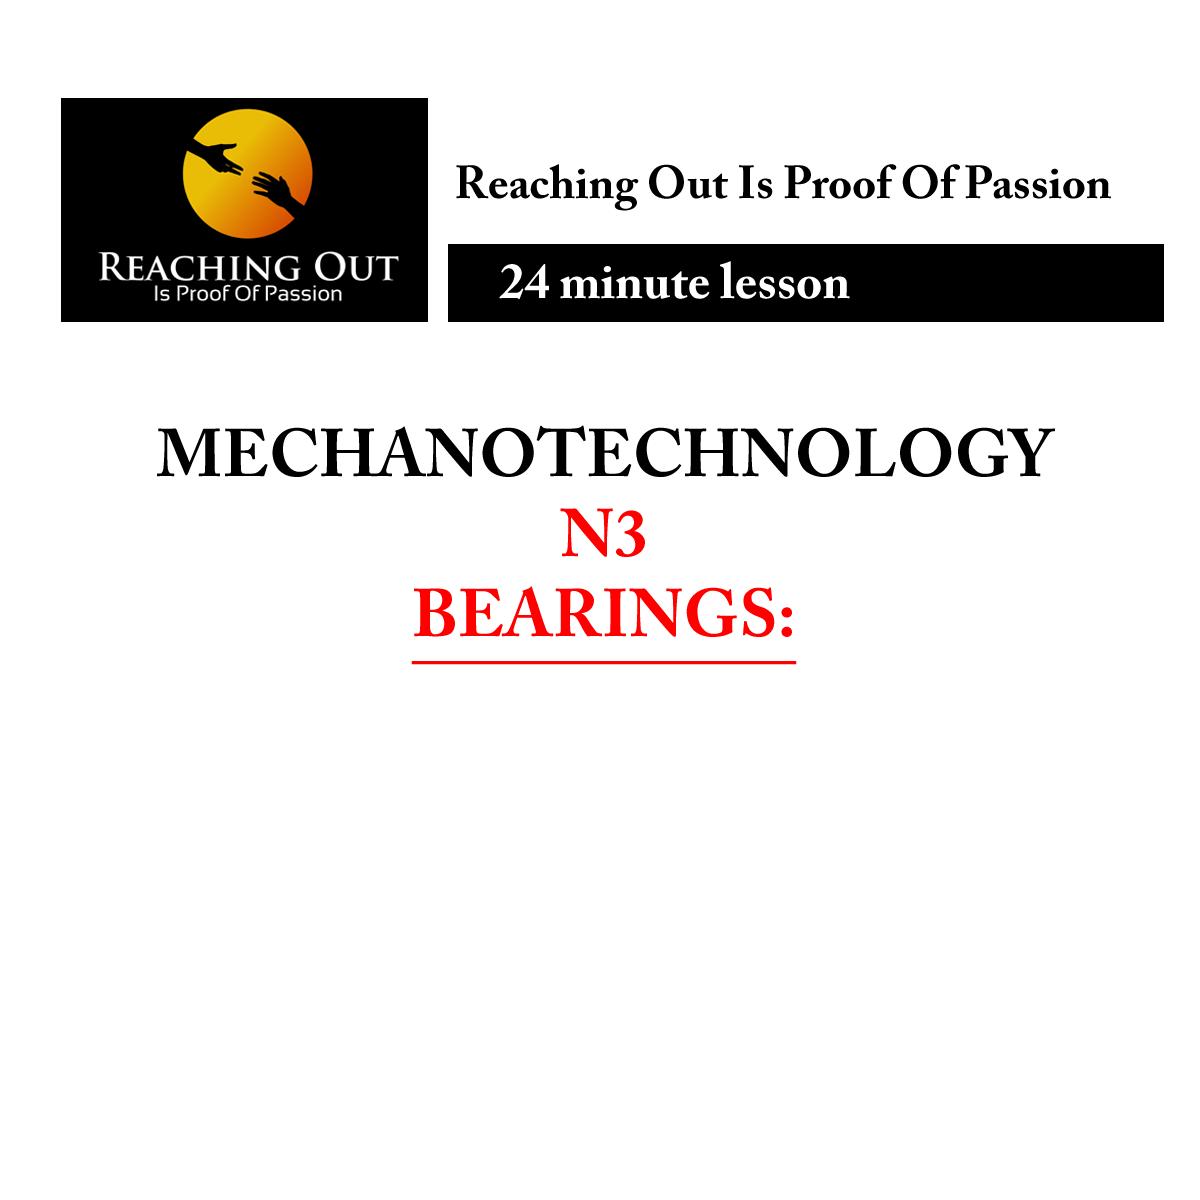 definition of mechanotechnology